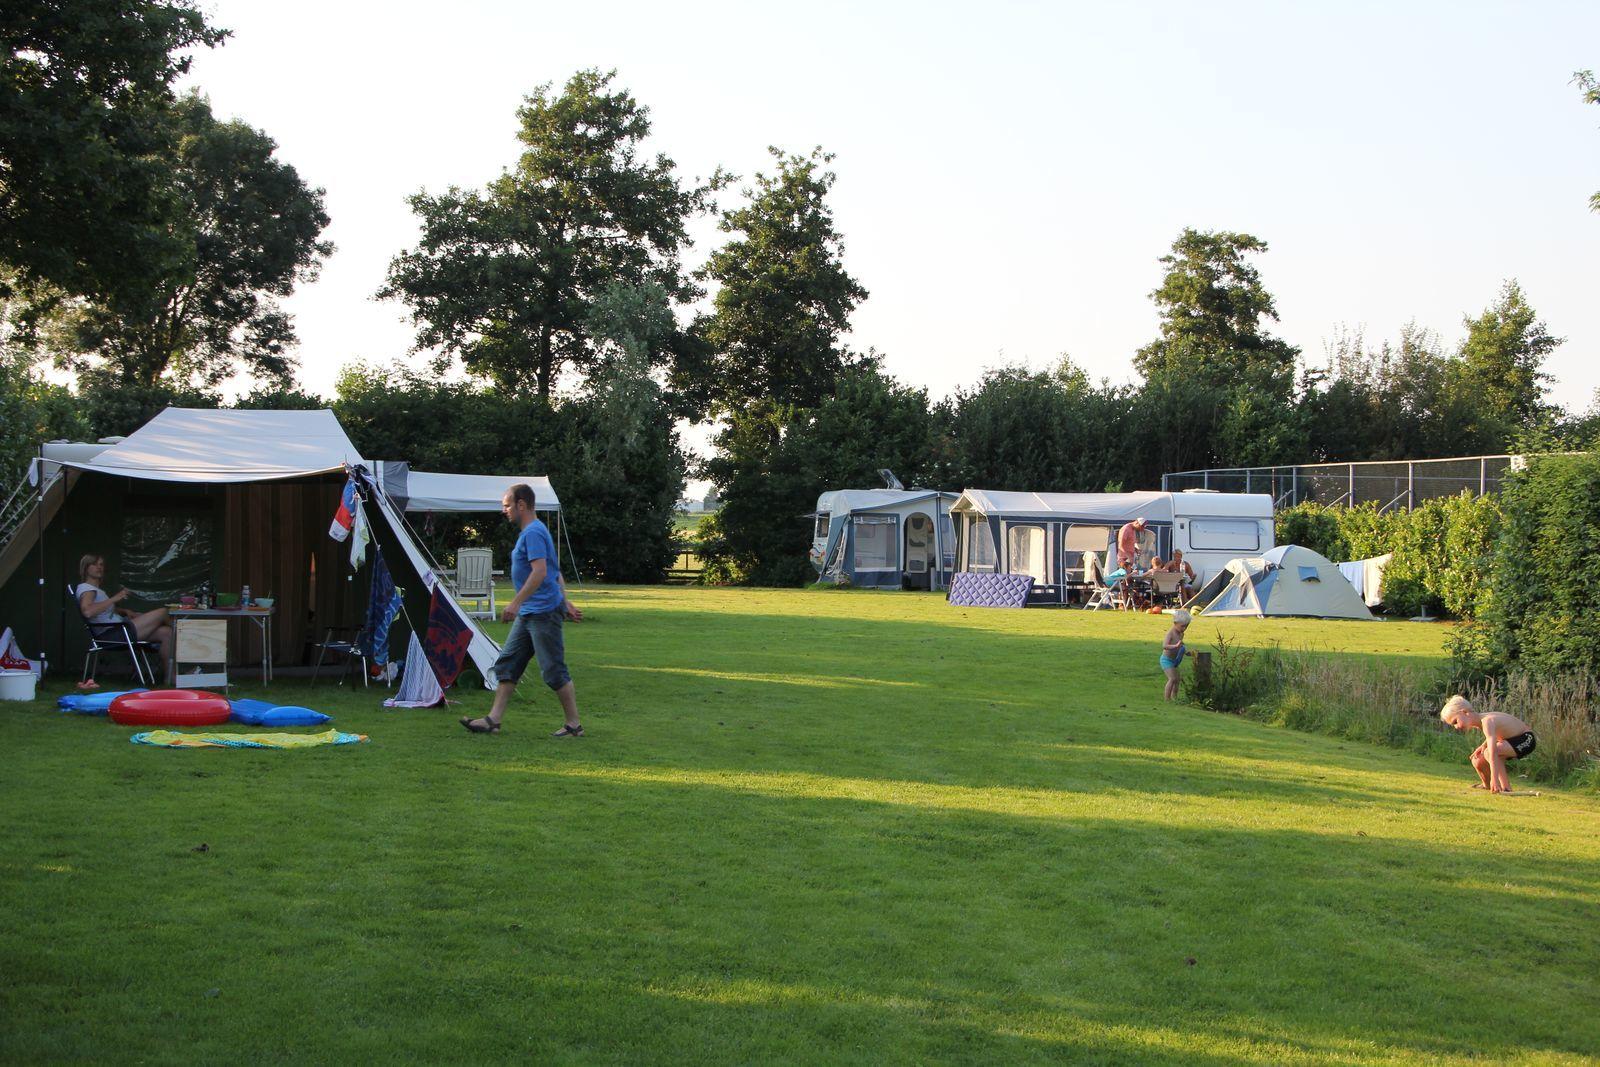 Kampeerplaats: Camper, Caravan of Tent, 6Amp